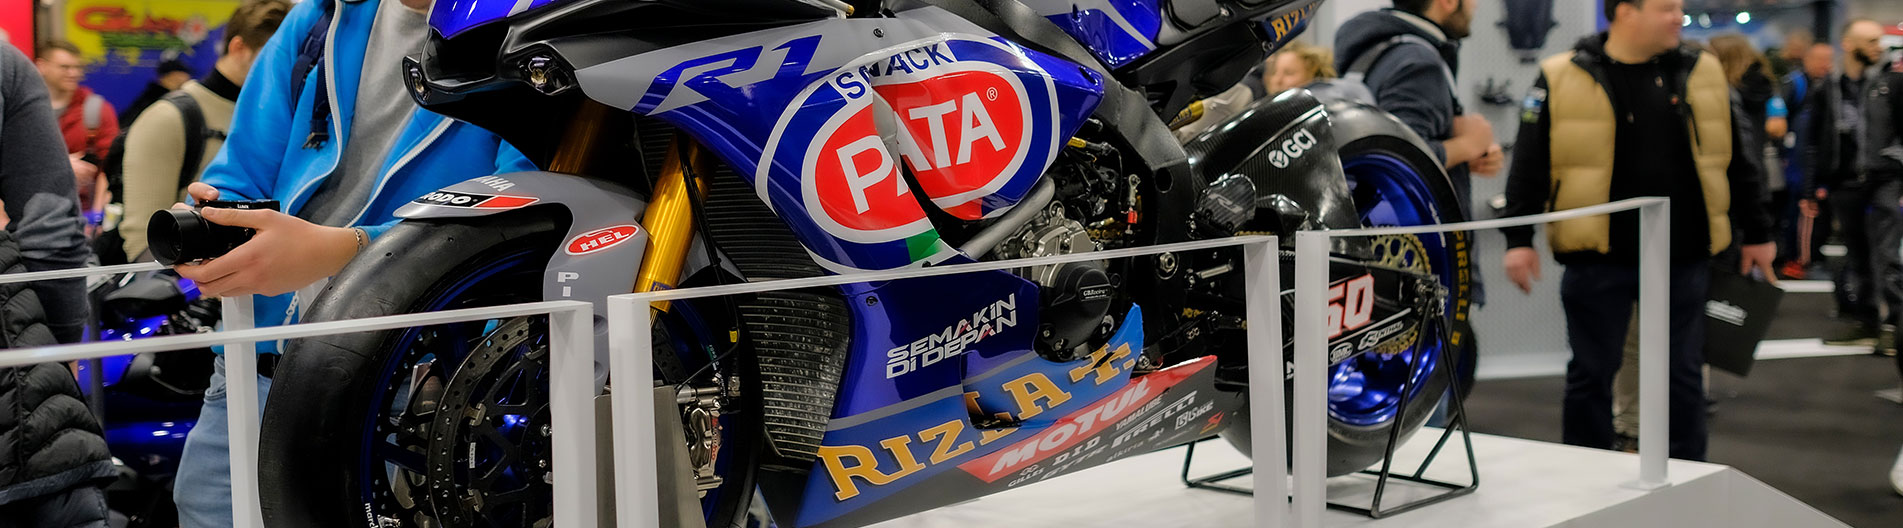 Verona rekindles the engine with Motor Bike Expo